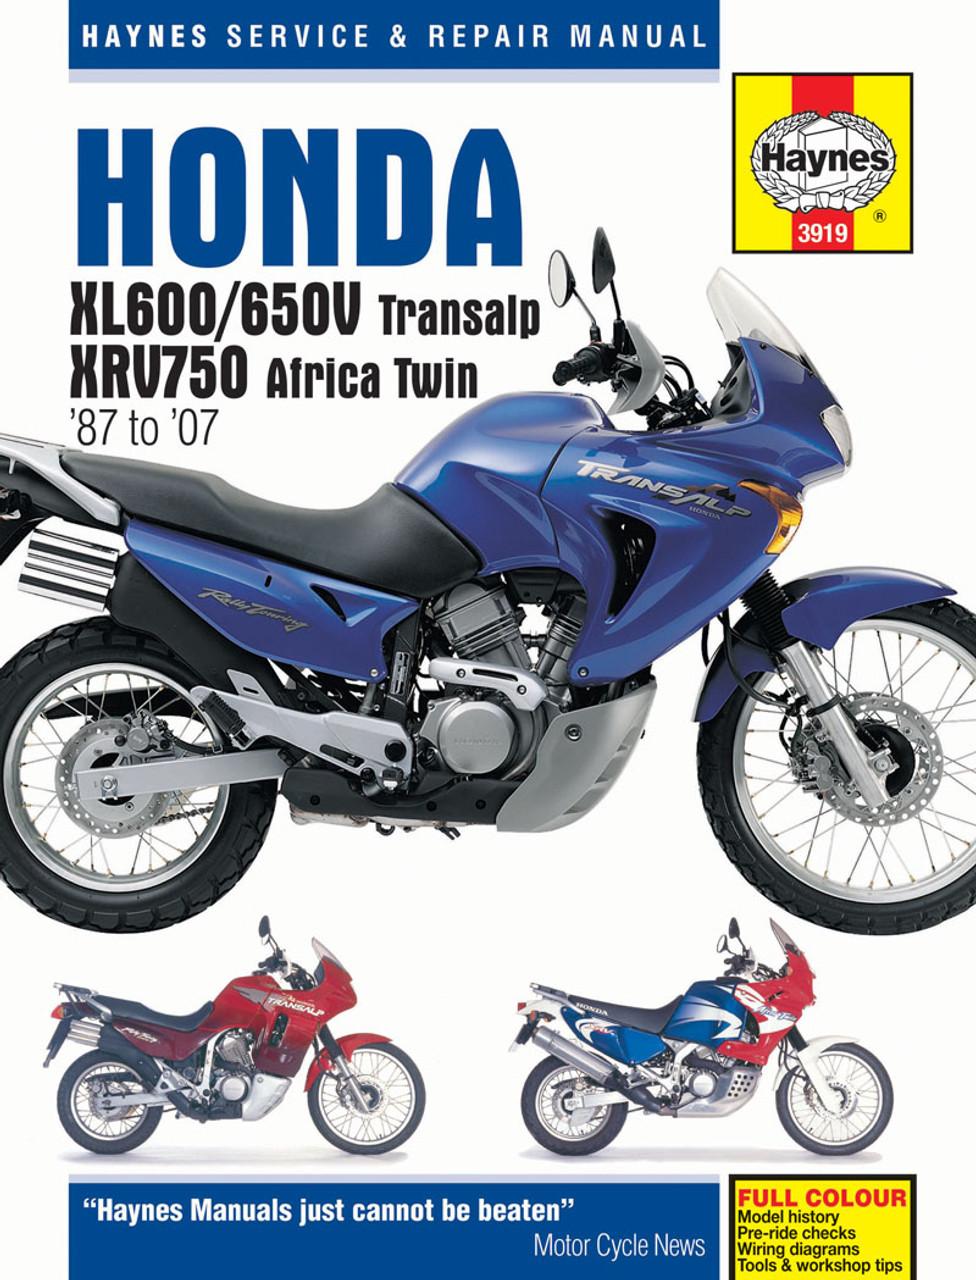 Honda Xl600650v Transalp Xrv750 Africa Twin 1987 2007 Haynes. Honda Xl600650v Transalp Xrv750 Africa Twin 1987 2007 Haynes Repair Manual. Honda. Wire Diagram 1985 Honda Xl600r At Scoala.co